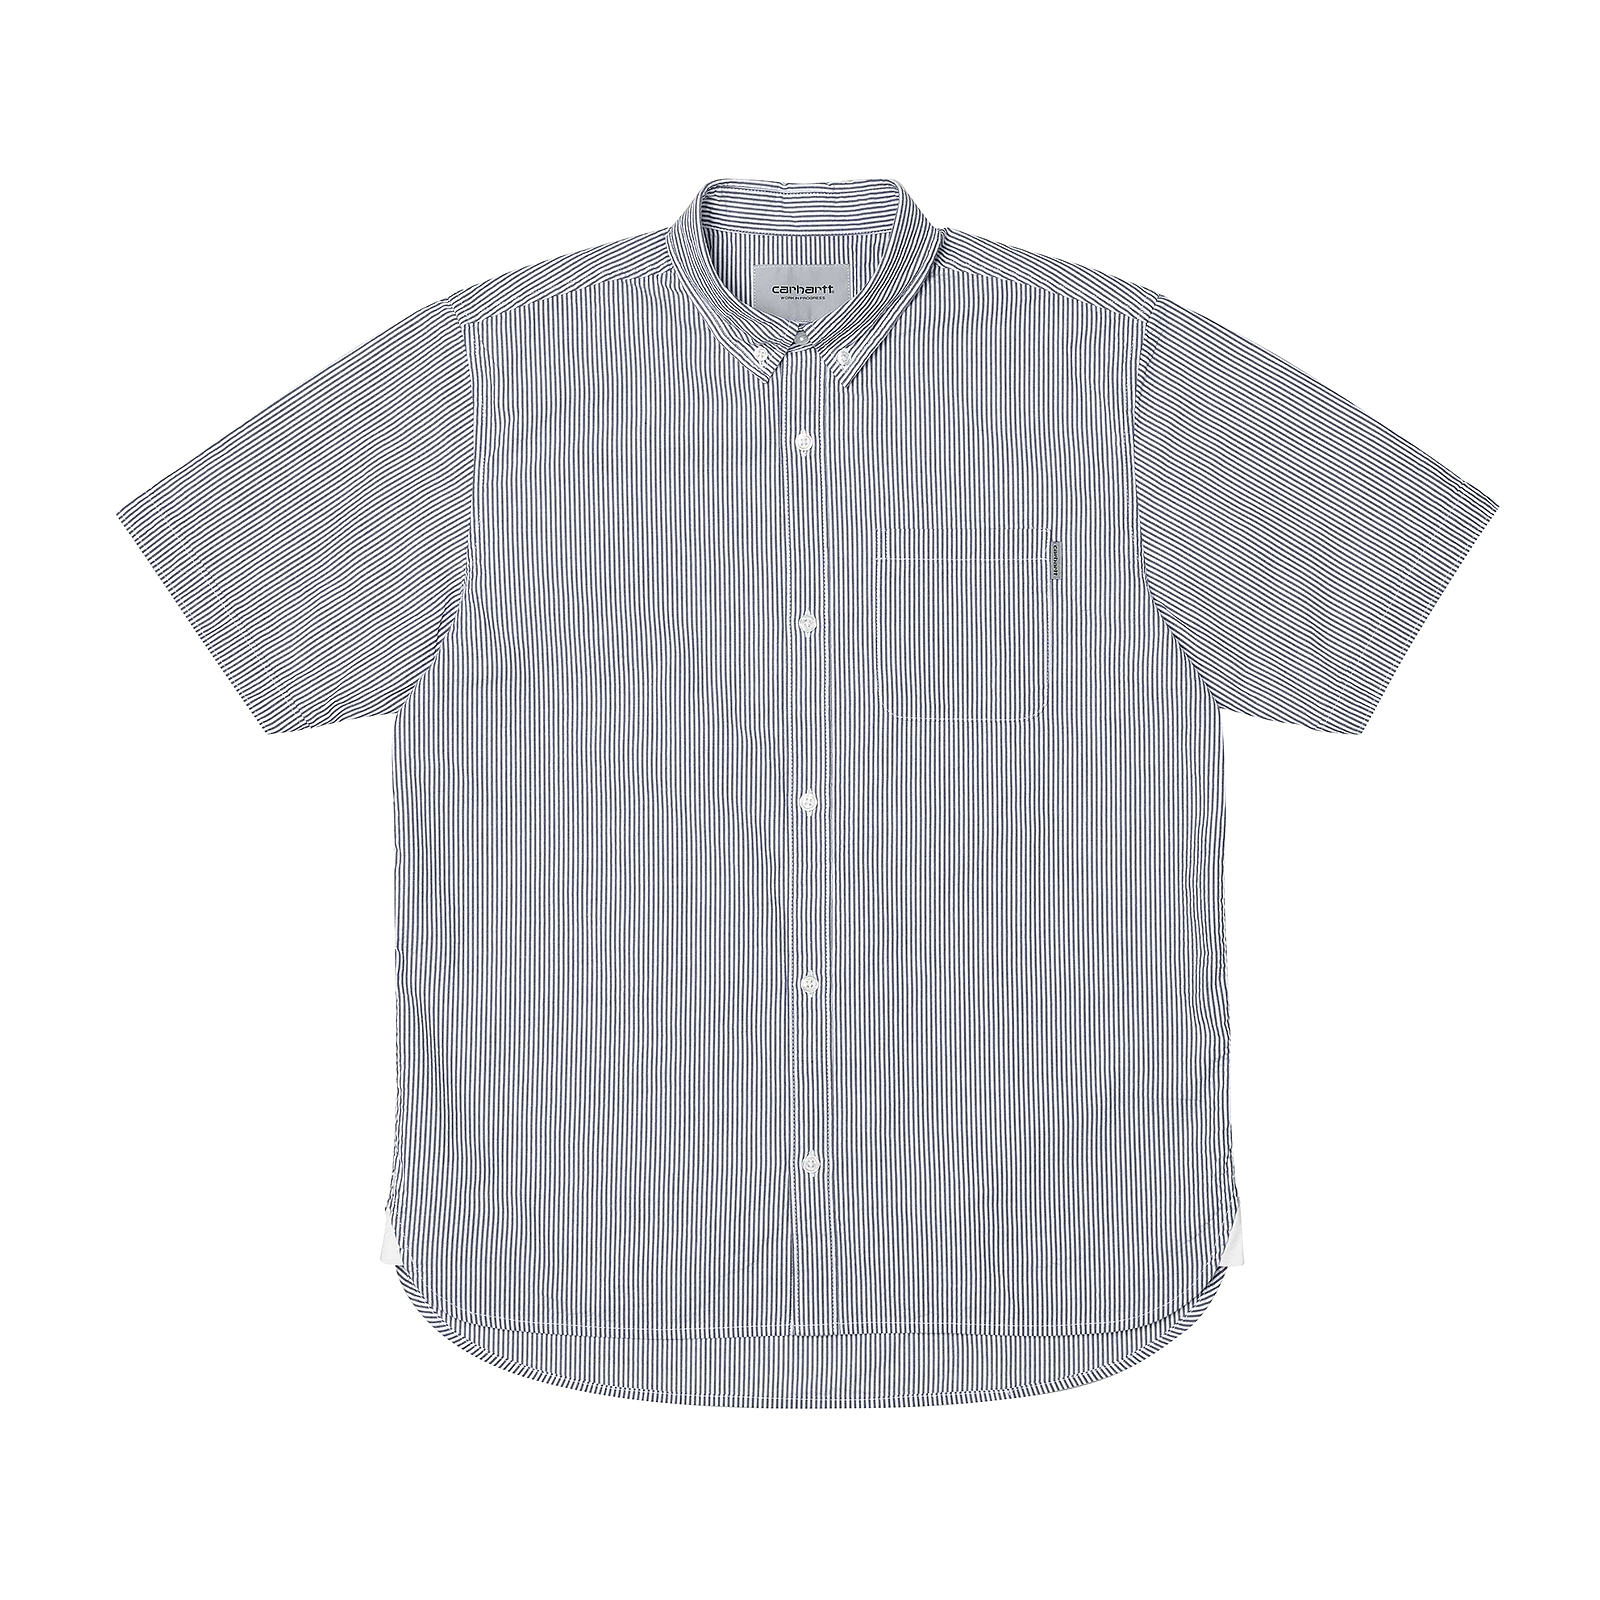 Carhartt Shirts S s Alder Shirt Alderstripe Stone bluee   White bluee